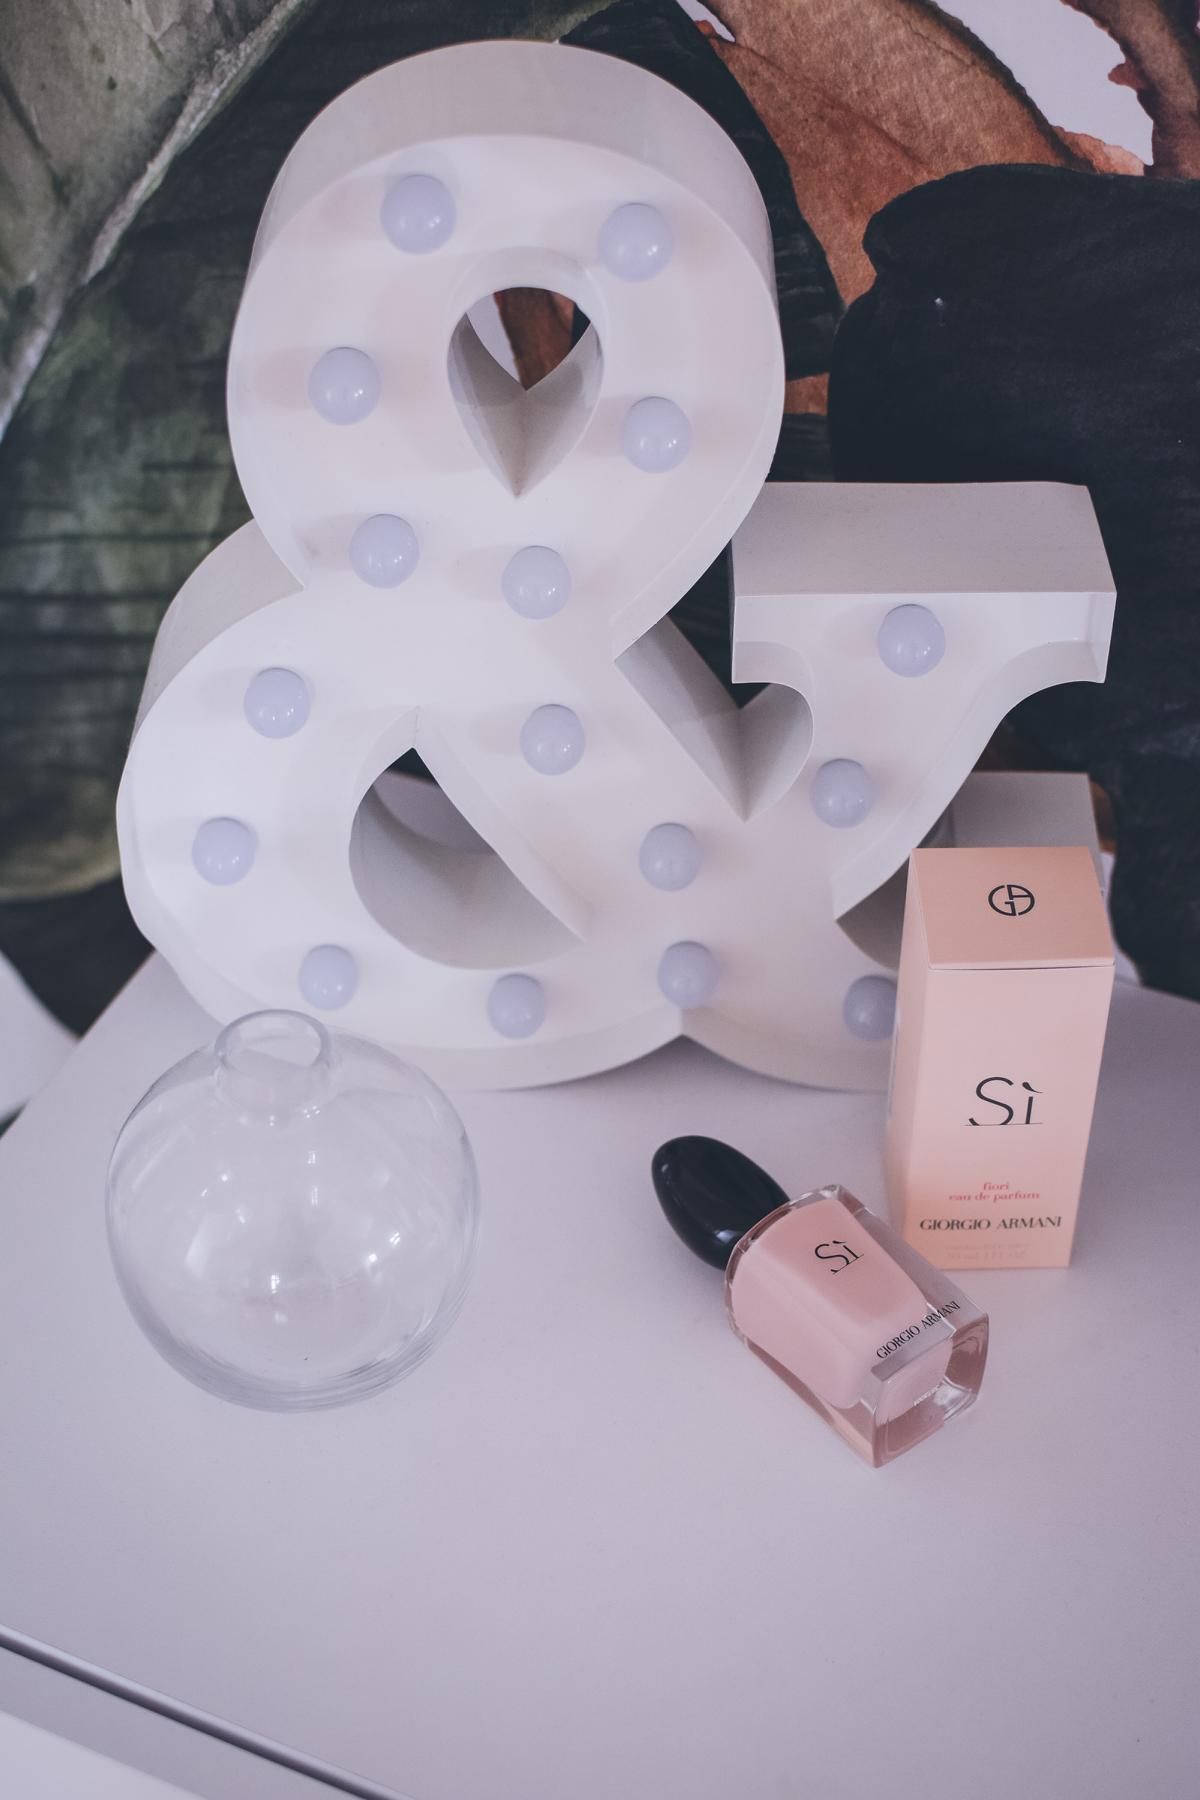 Angesagtes Pafum von Giorgio Armani mit Namen Si